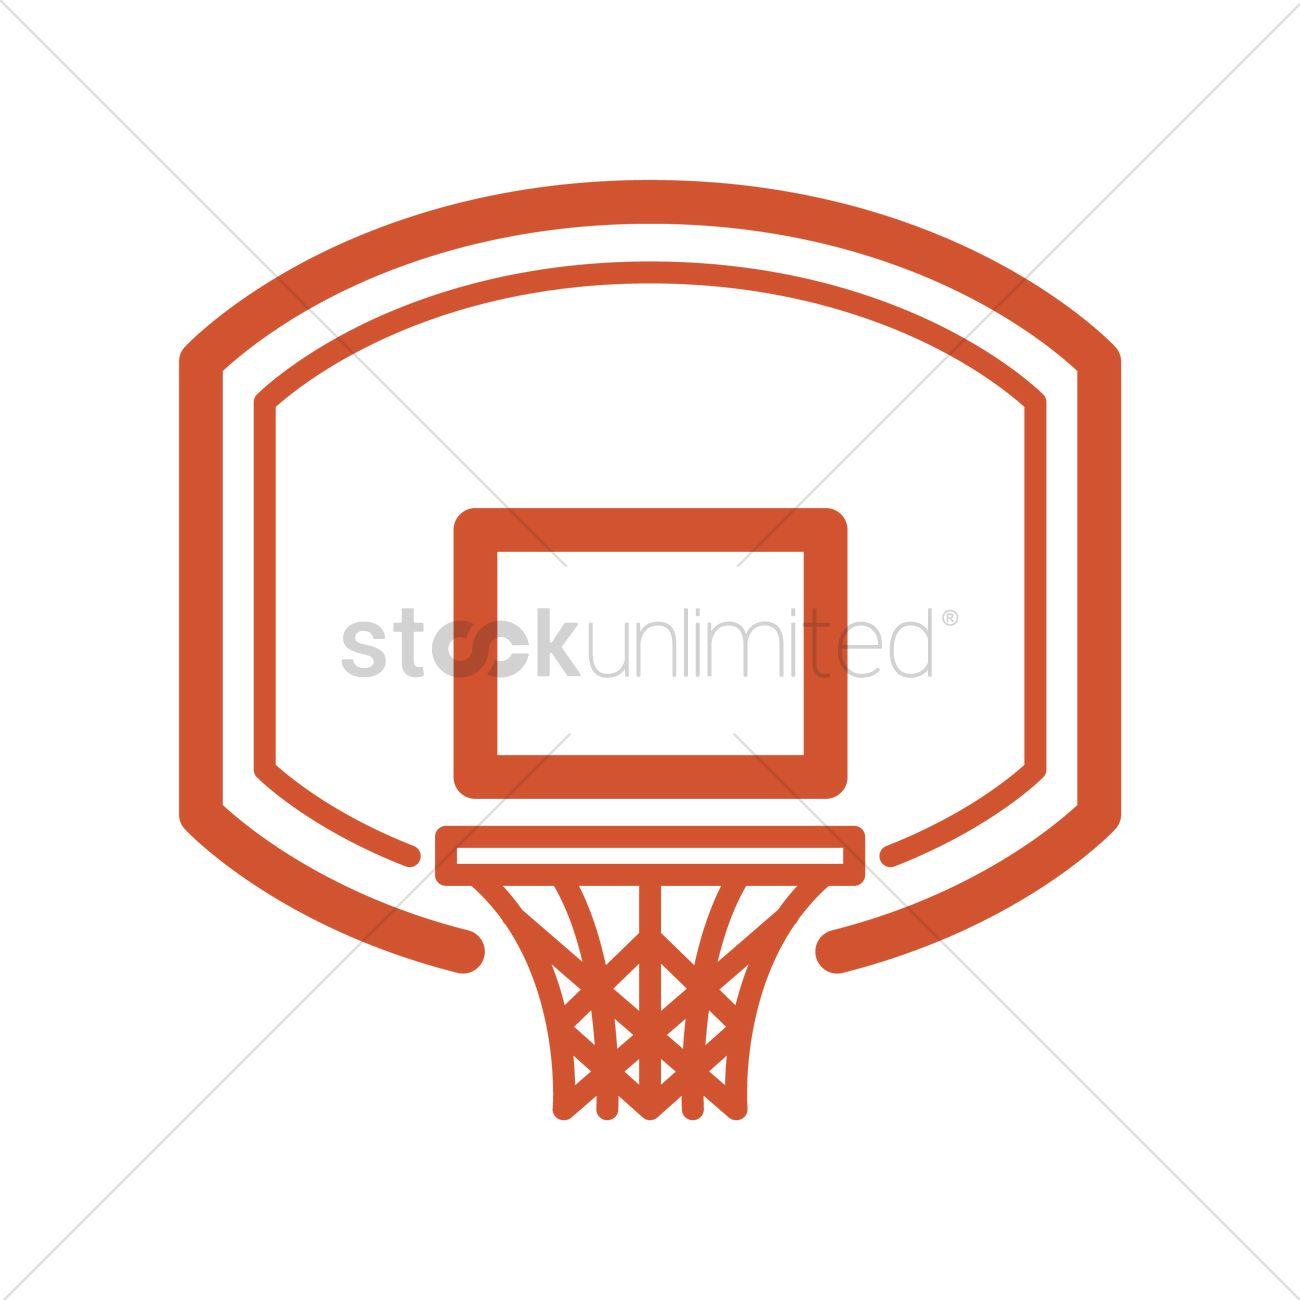 Basketball backboard and rim Vector Image.